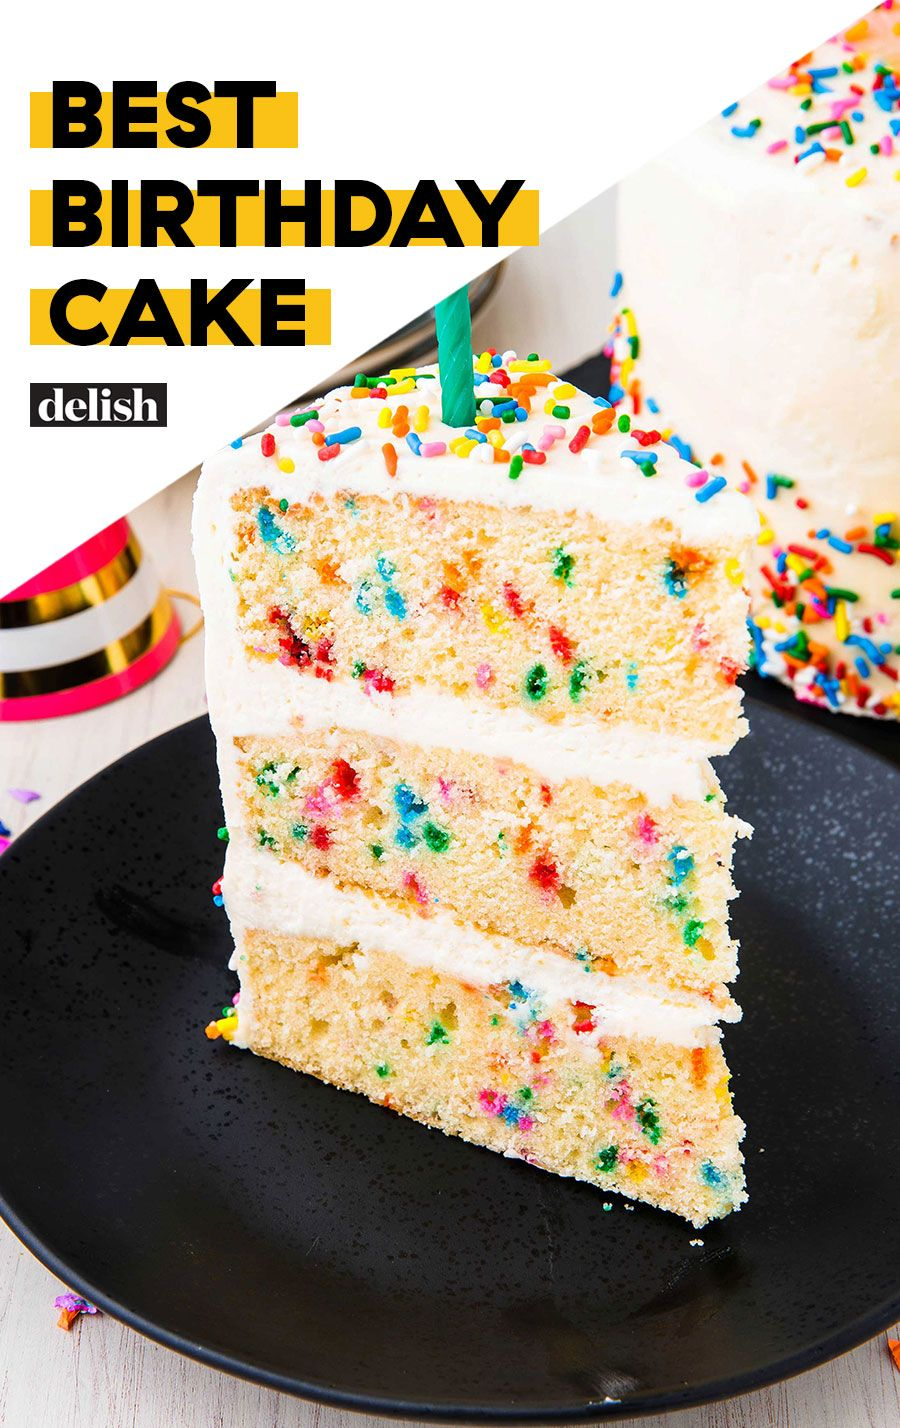 Sensational Perfect Birthday Cake Recipe Cake Recipes Cool Birthday Cakes Funny Birthday Cards Online Fluifree Goldxyz